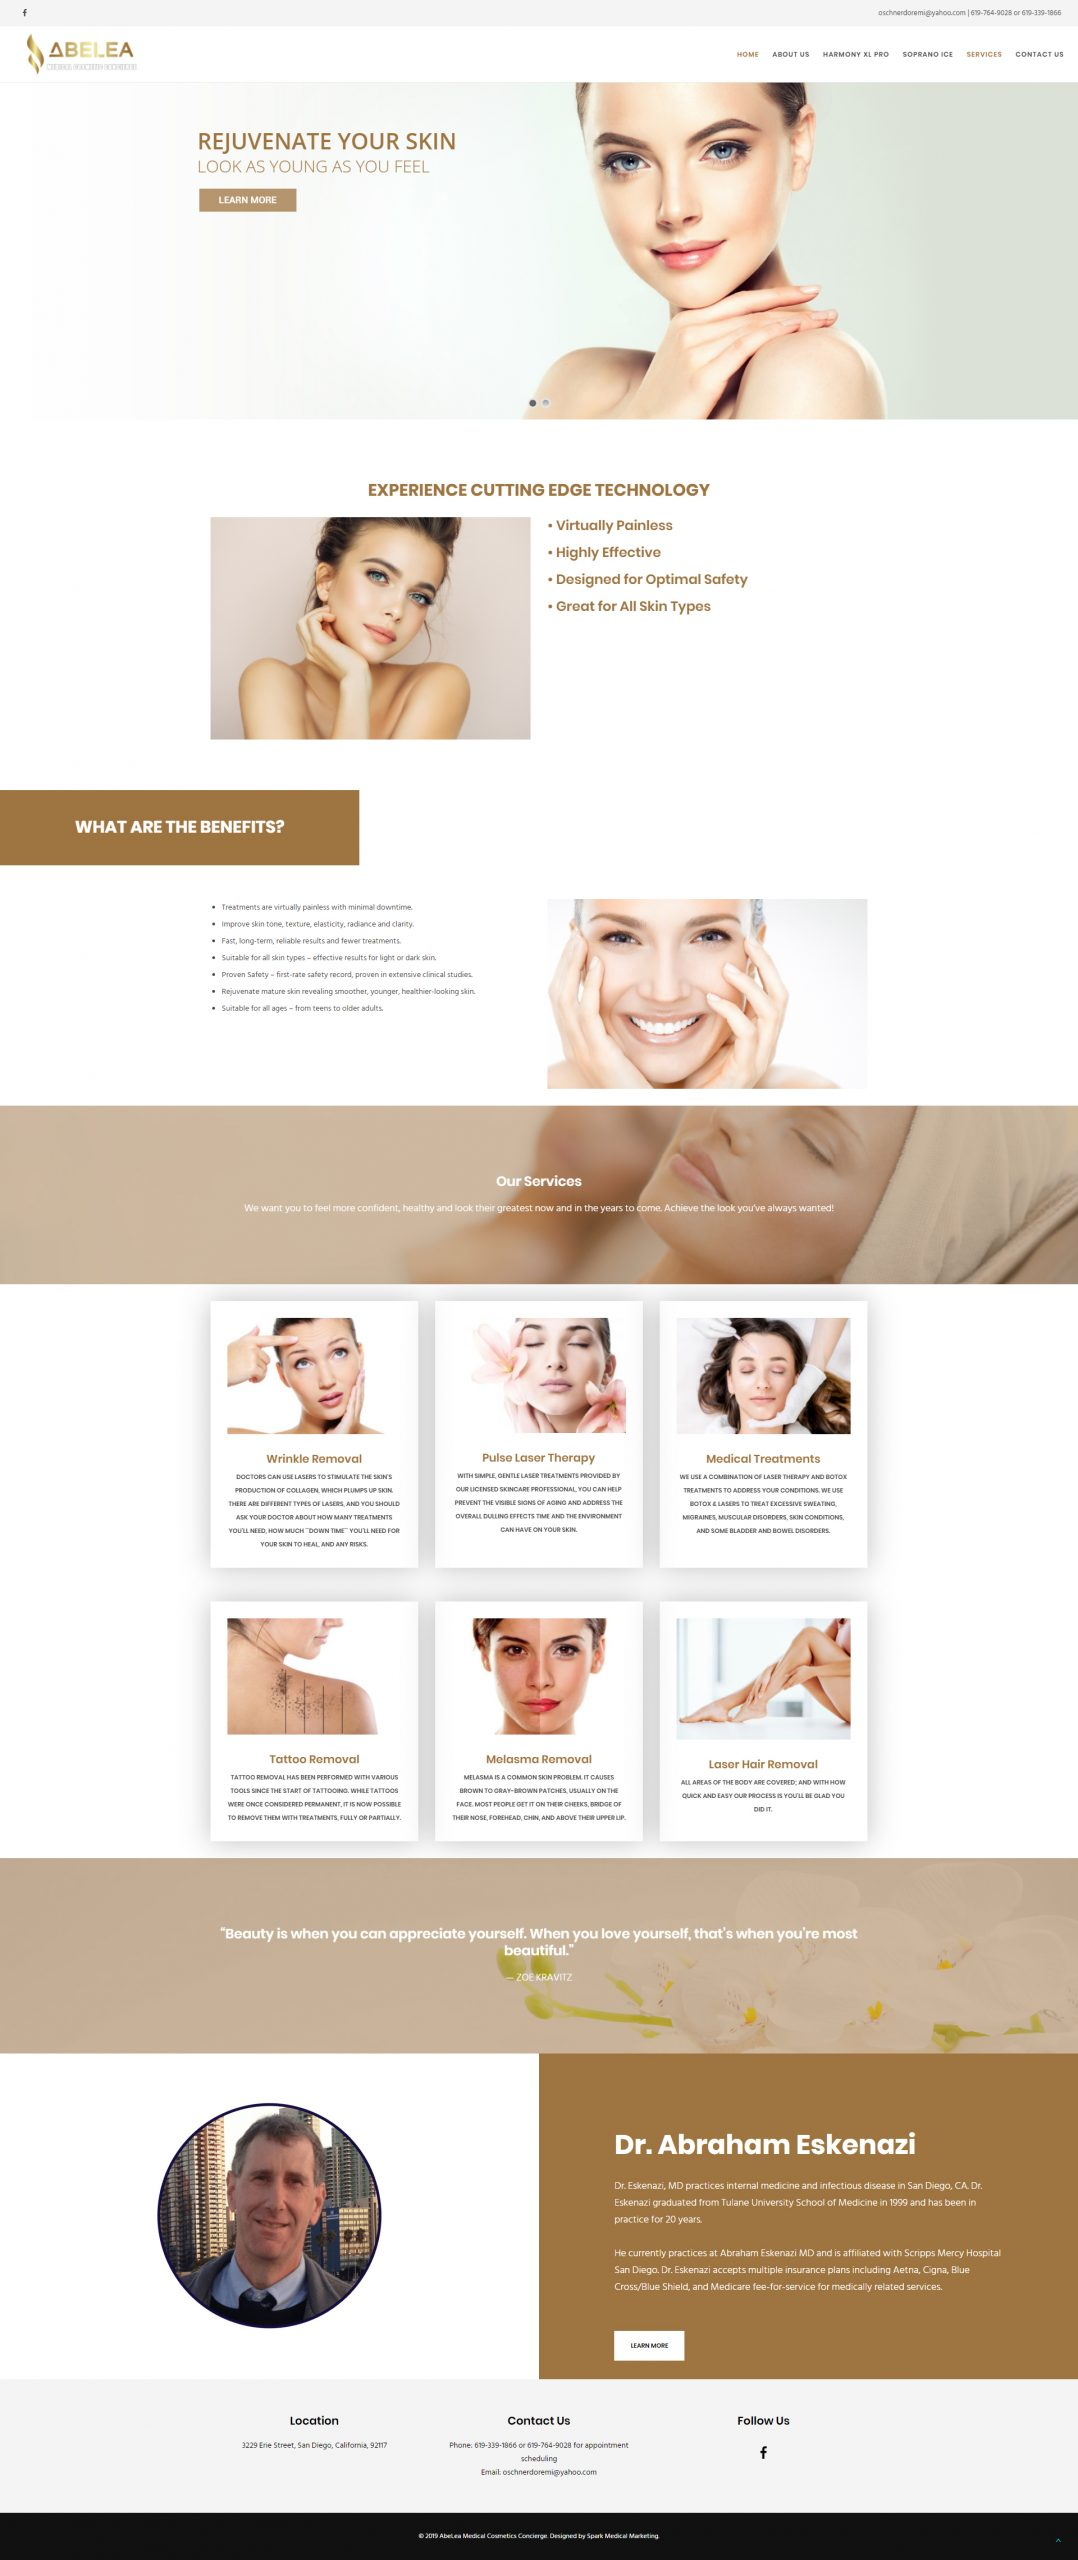 Abelea Homepage